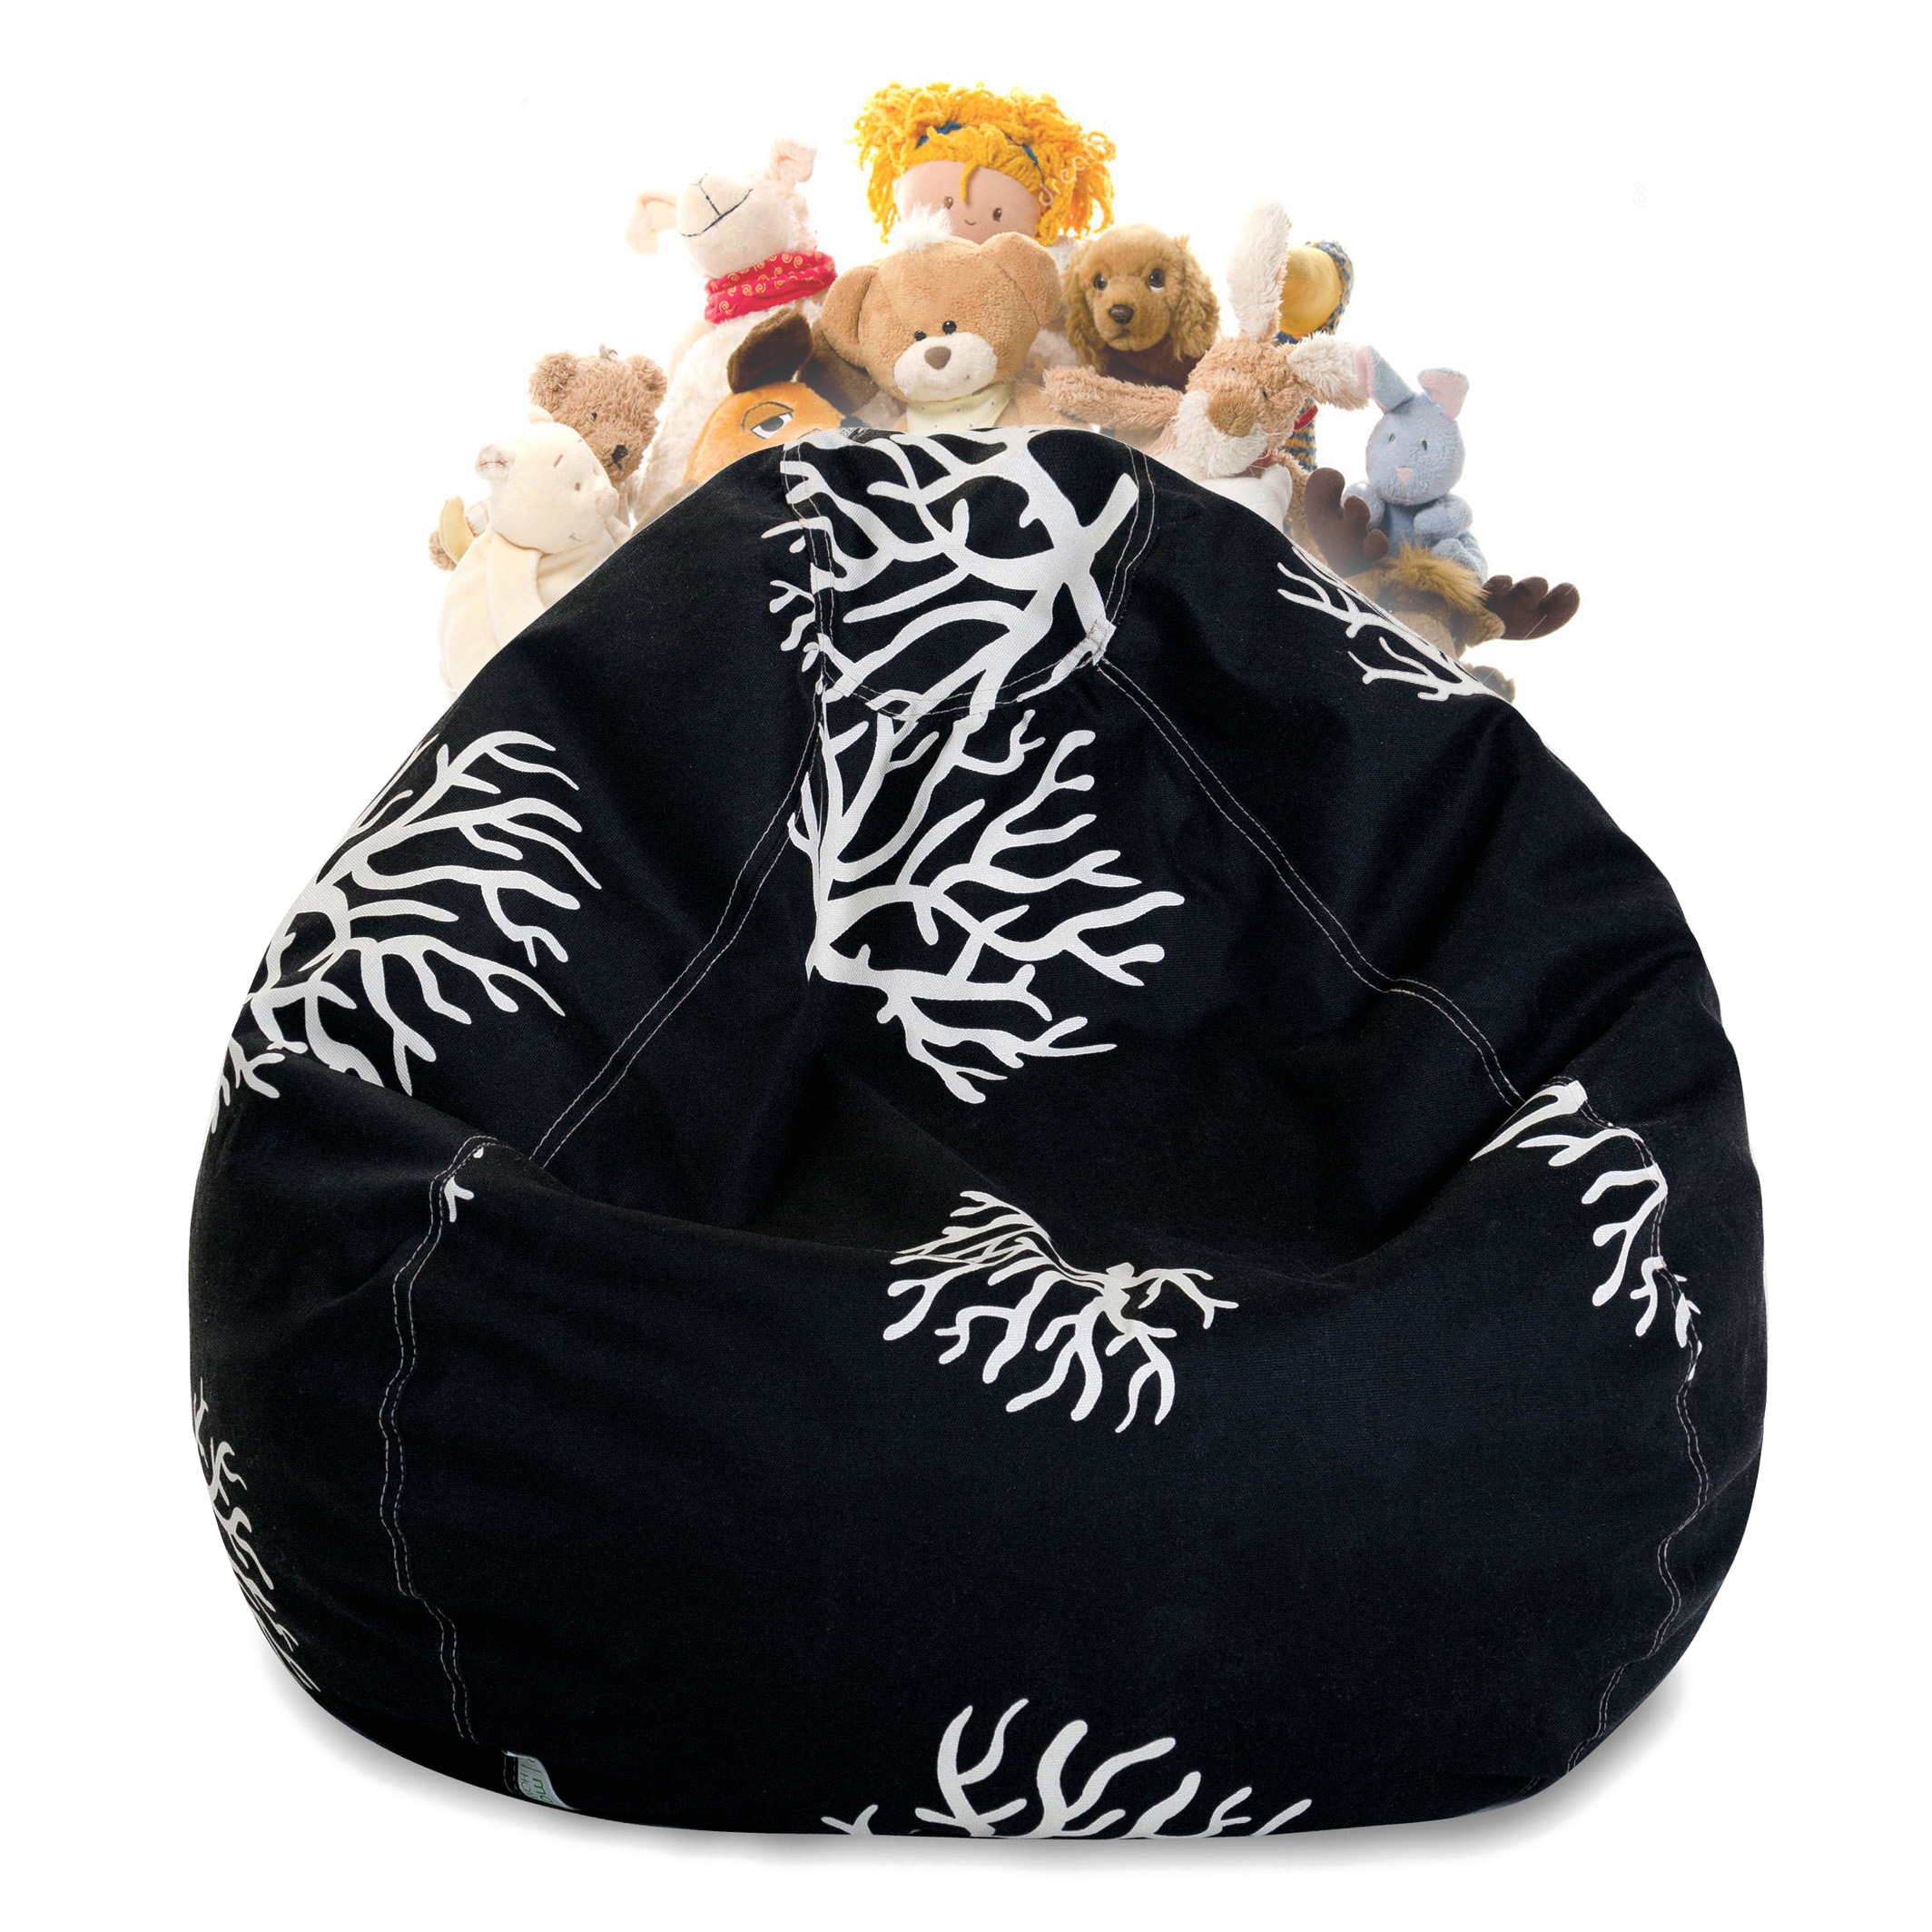 Majestic Home Goods Coral Stuffed Animal Storage Bean Bag